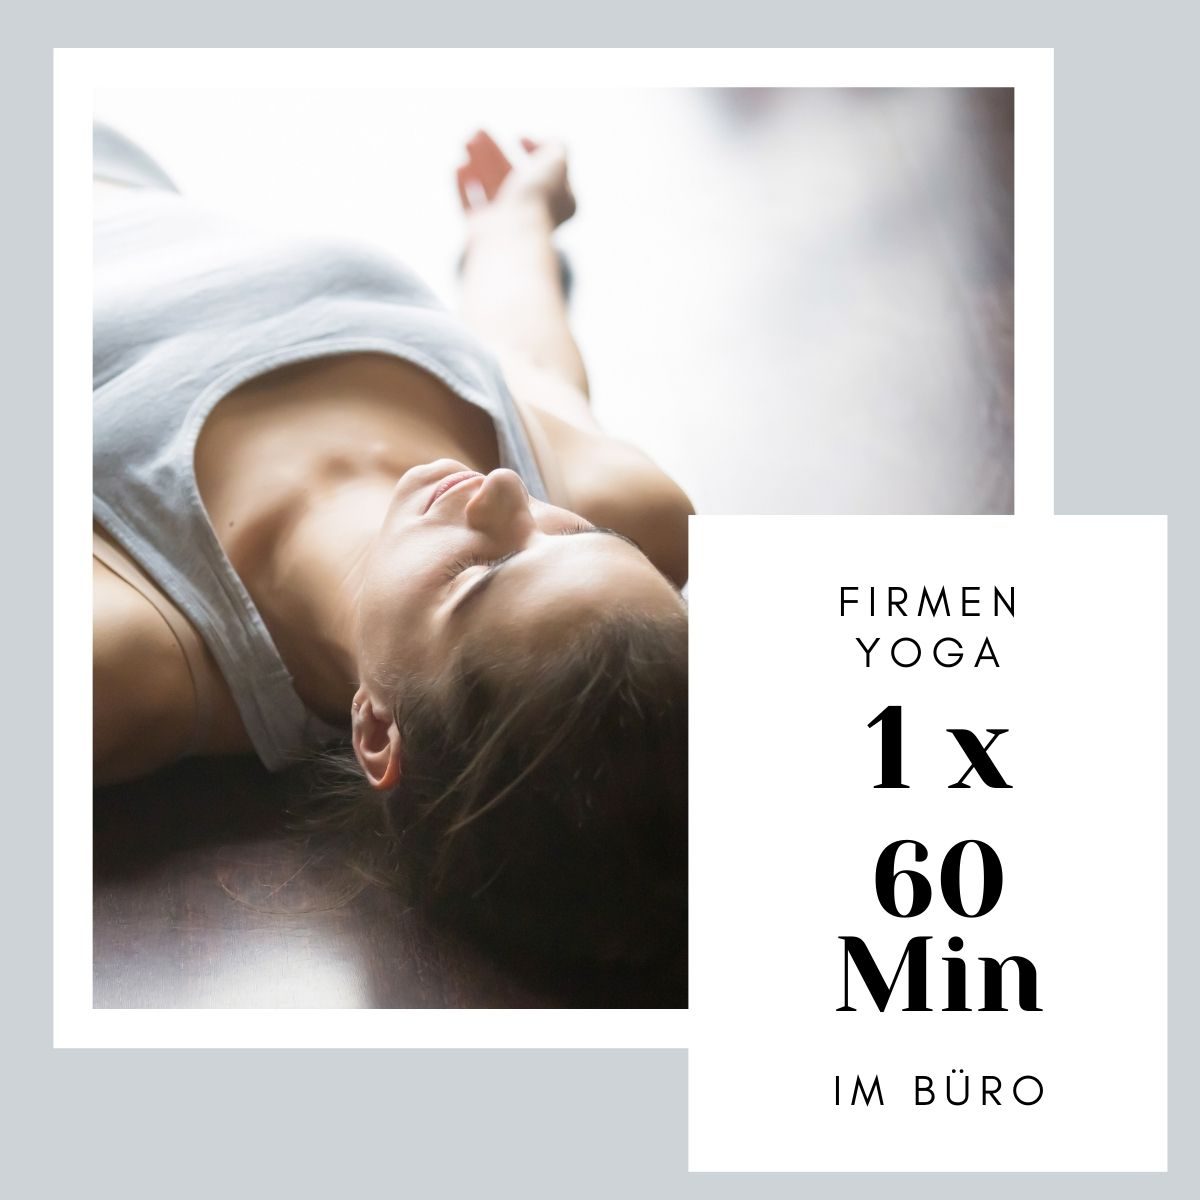 firmen-yoga-business-yoga-im-buero-einzeltermin